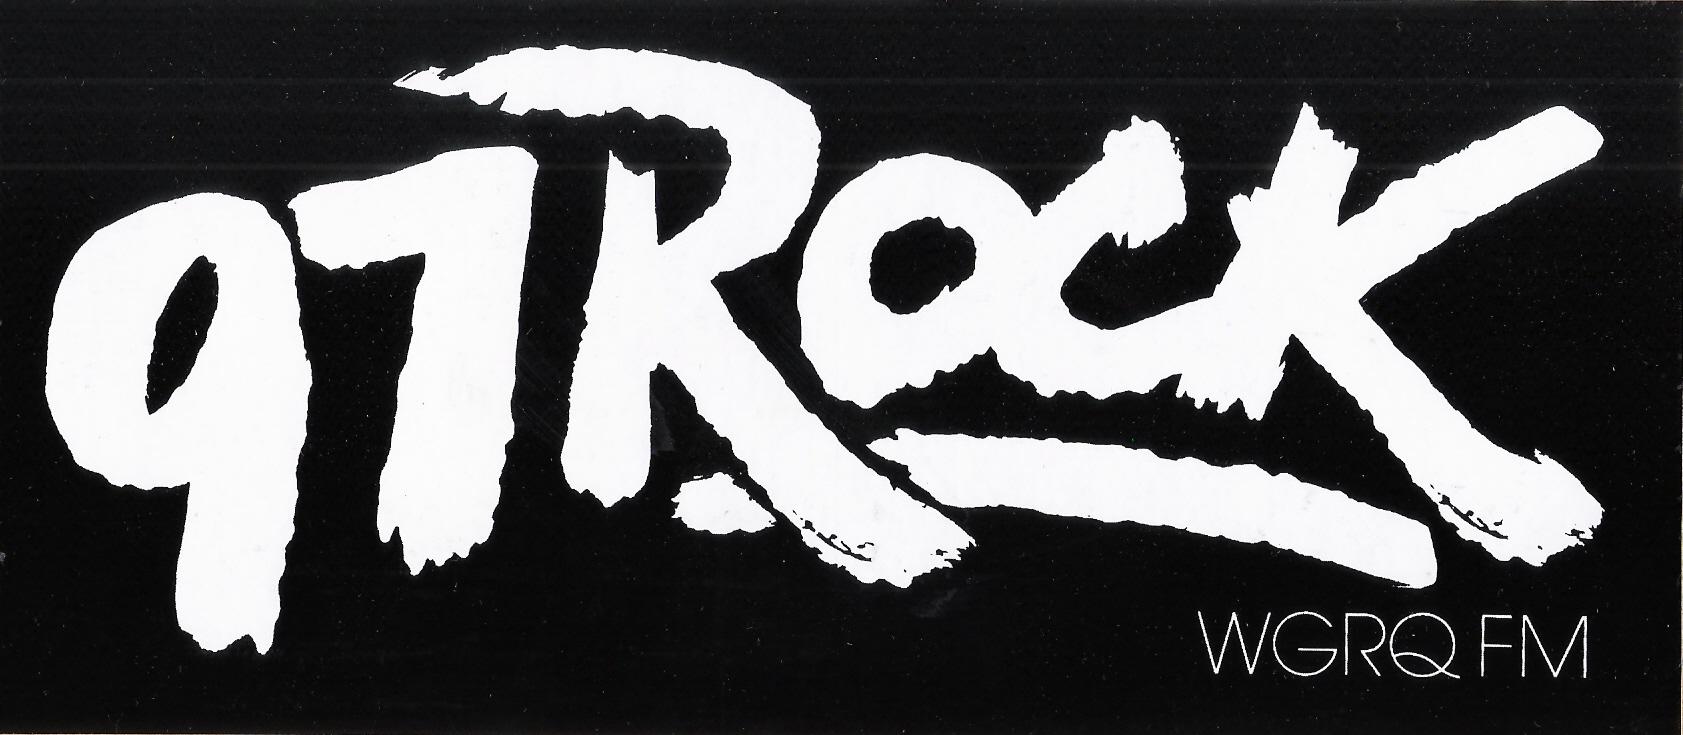 97 Rock Bumper Sticker 1981